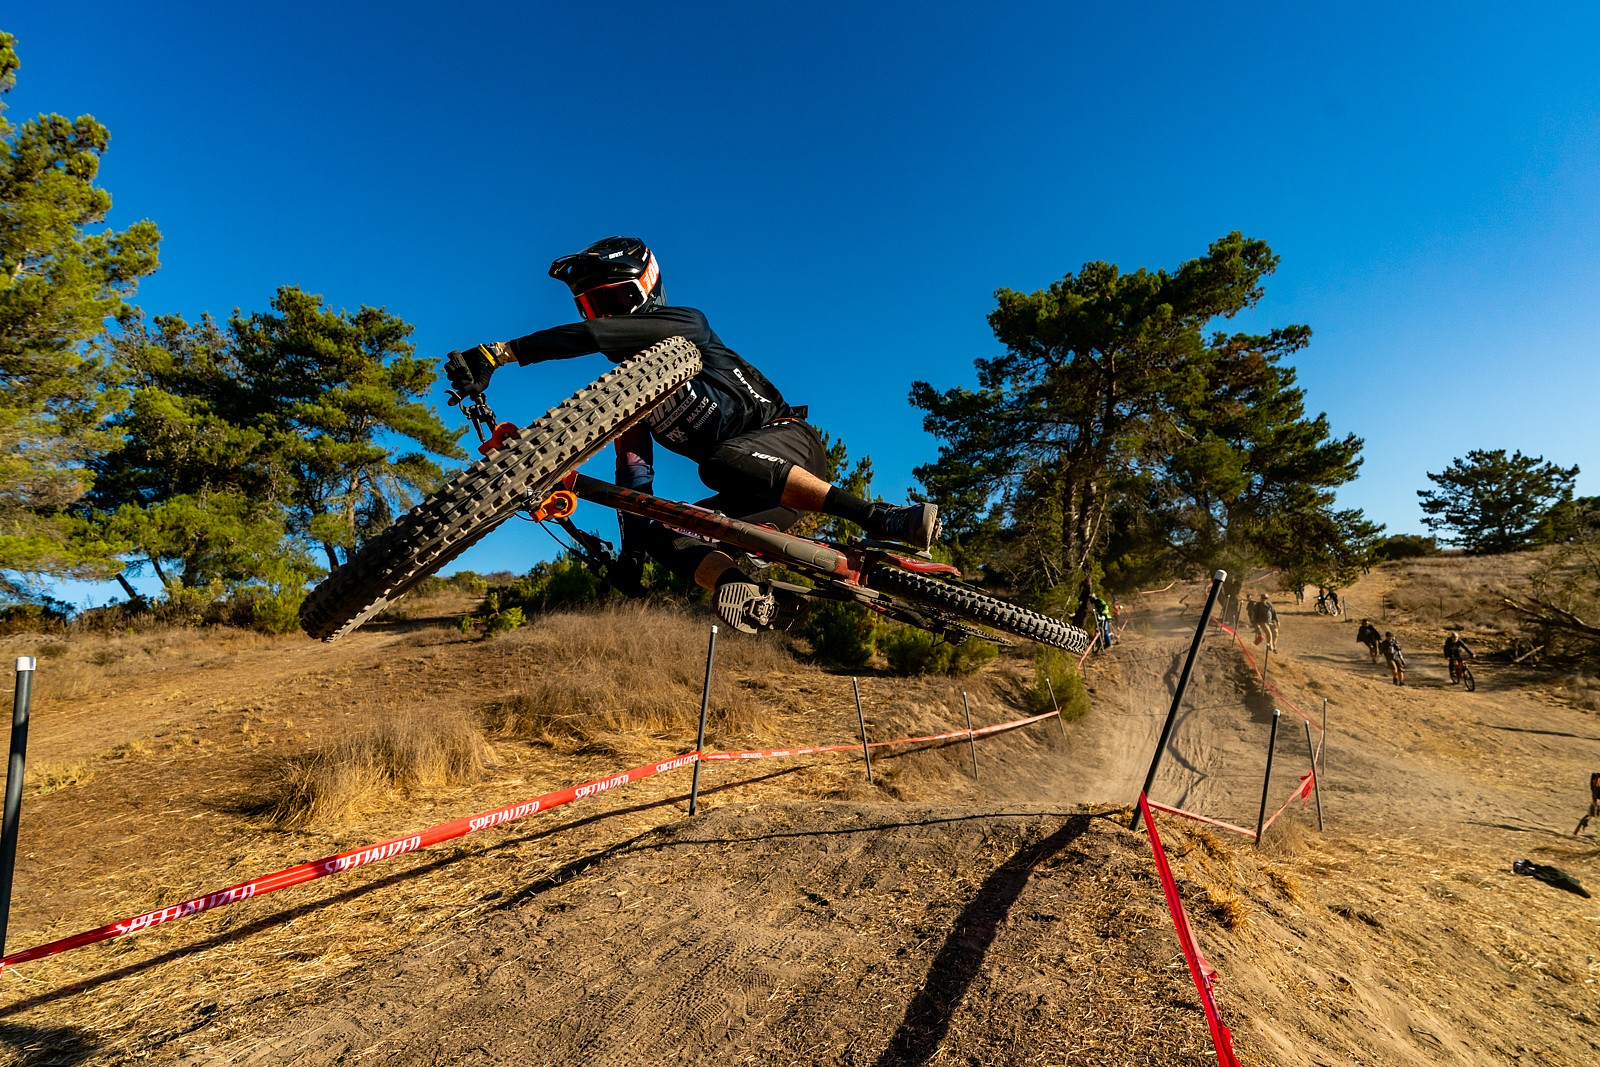 Matt Sterling - Zuestman - Mountain Biking Pictures - Vital MTB